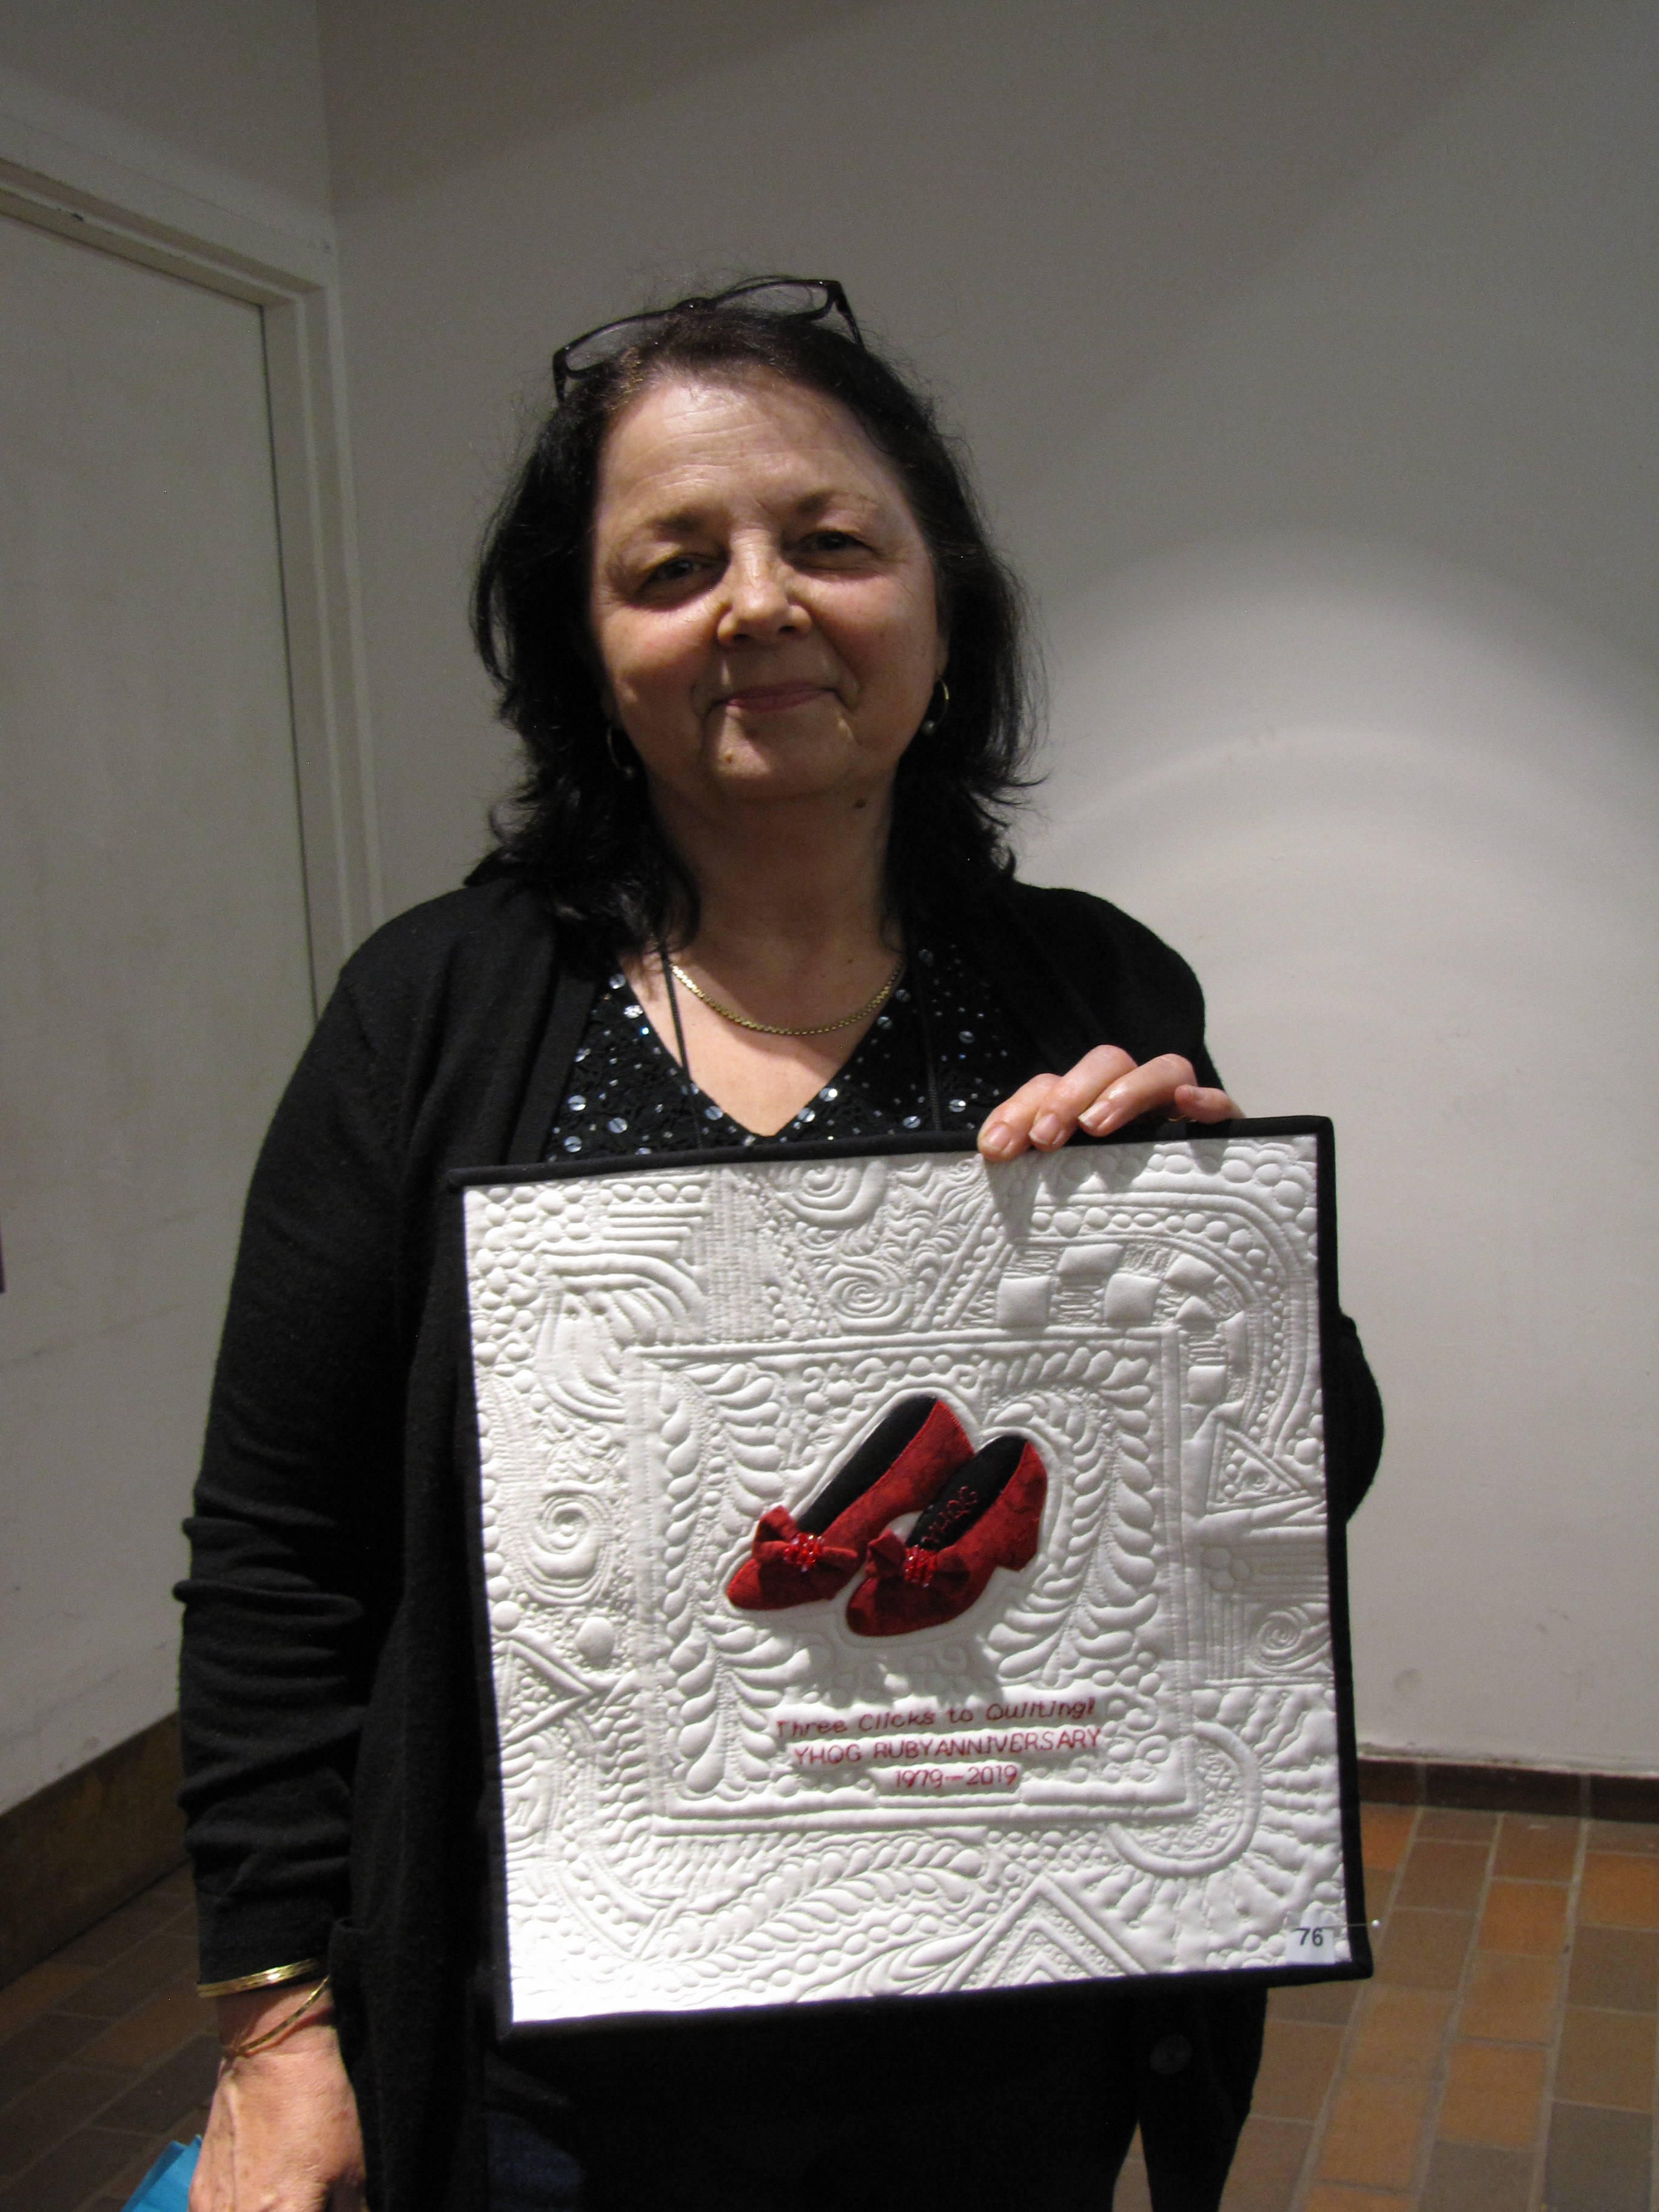 Tella Visconti holds her winning entry